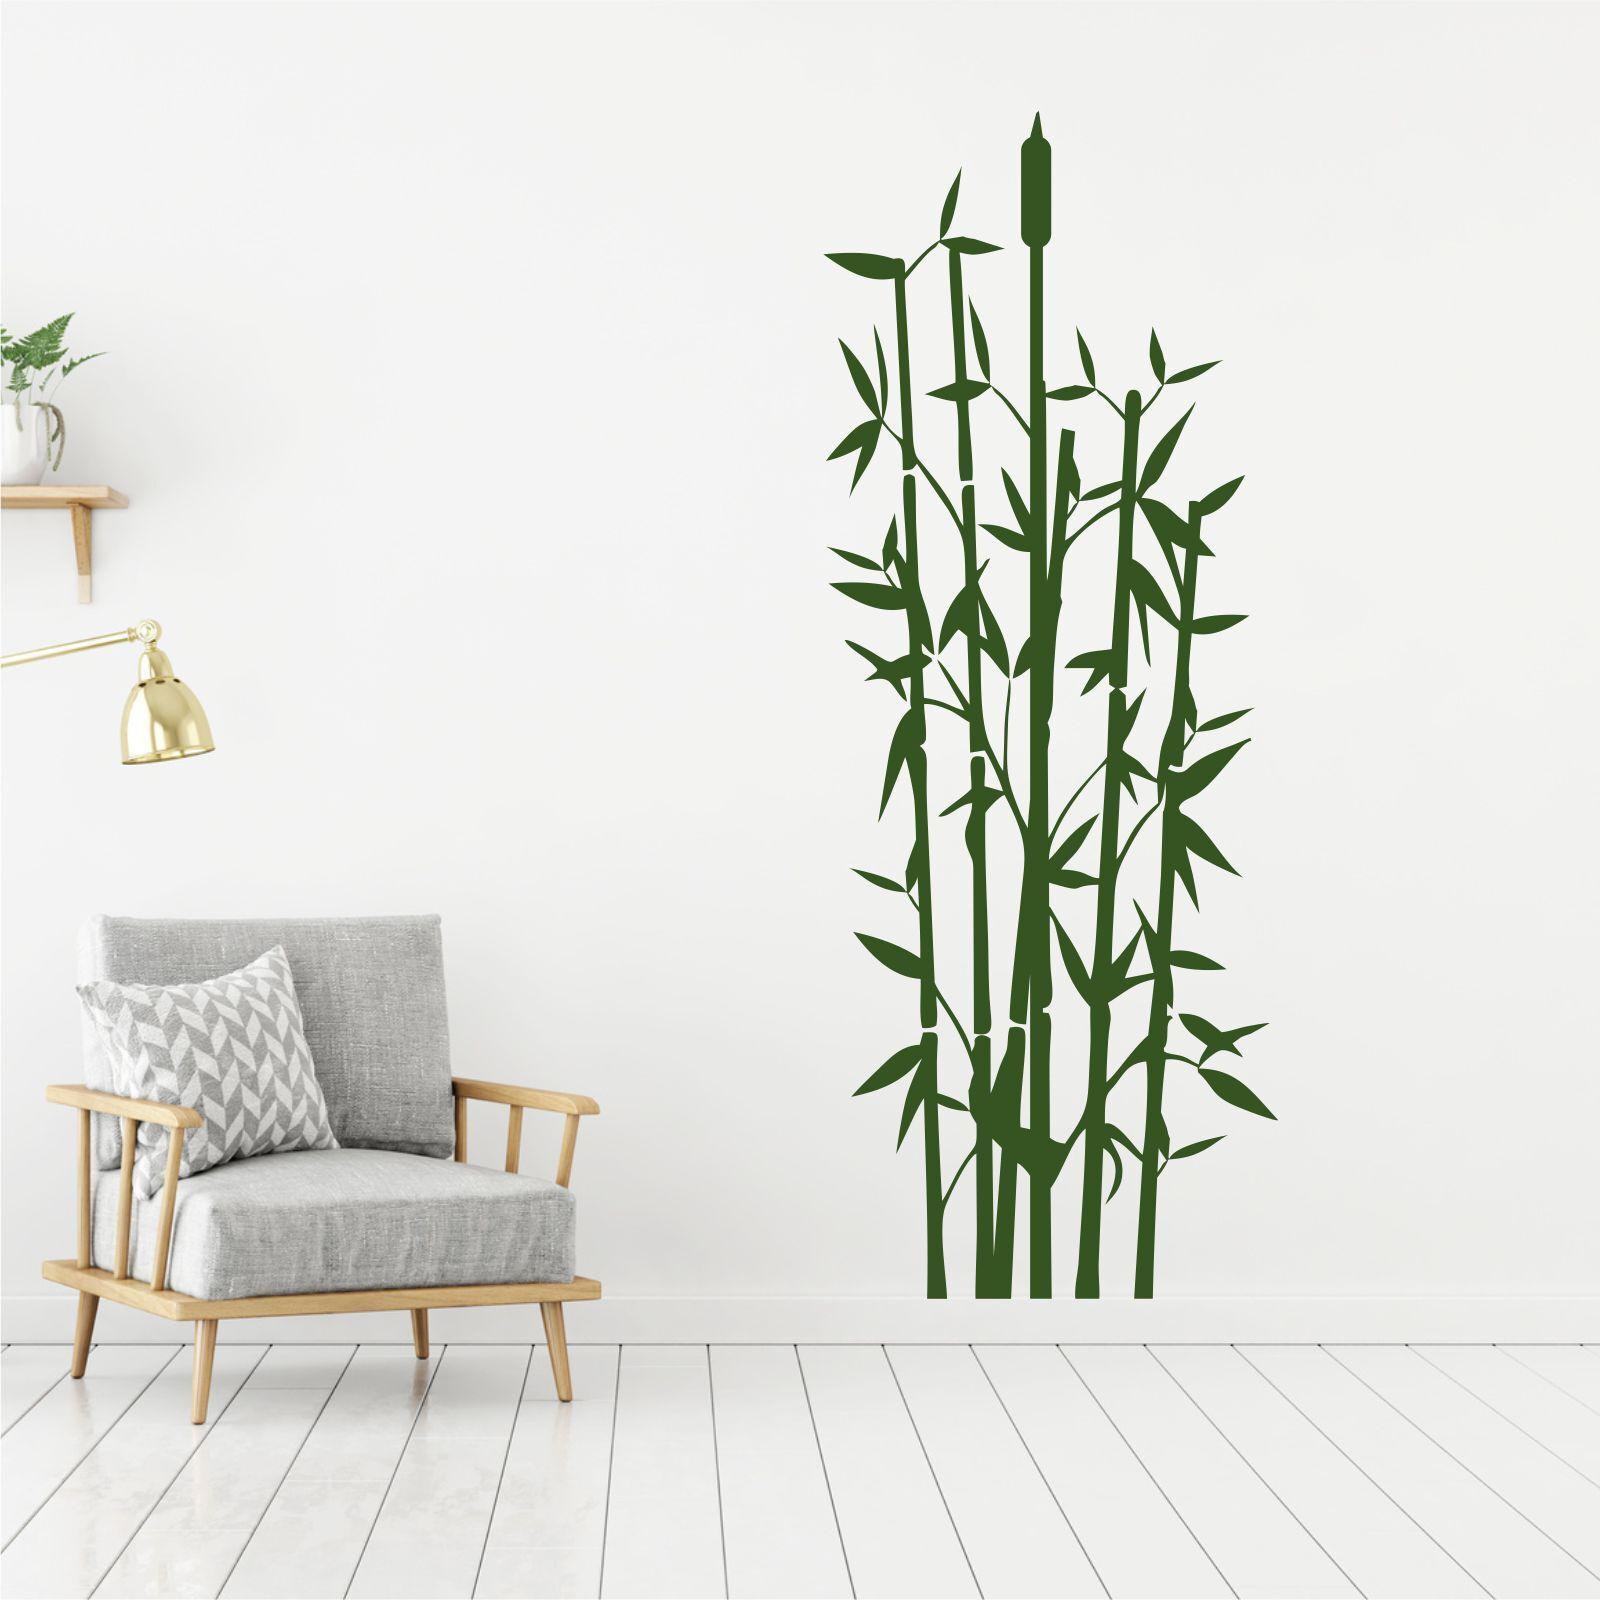 wandtattoo wandsticker wandaufkleber flur badezimmer bambus gras wt024 ebay. Black Bedroom Furniture Sets. Home Design Ideas